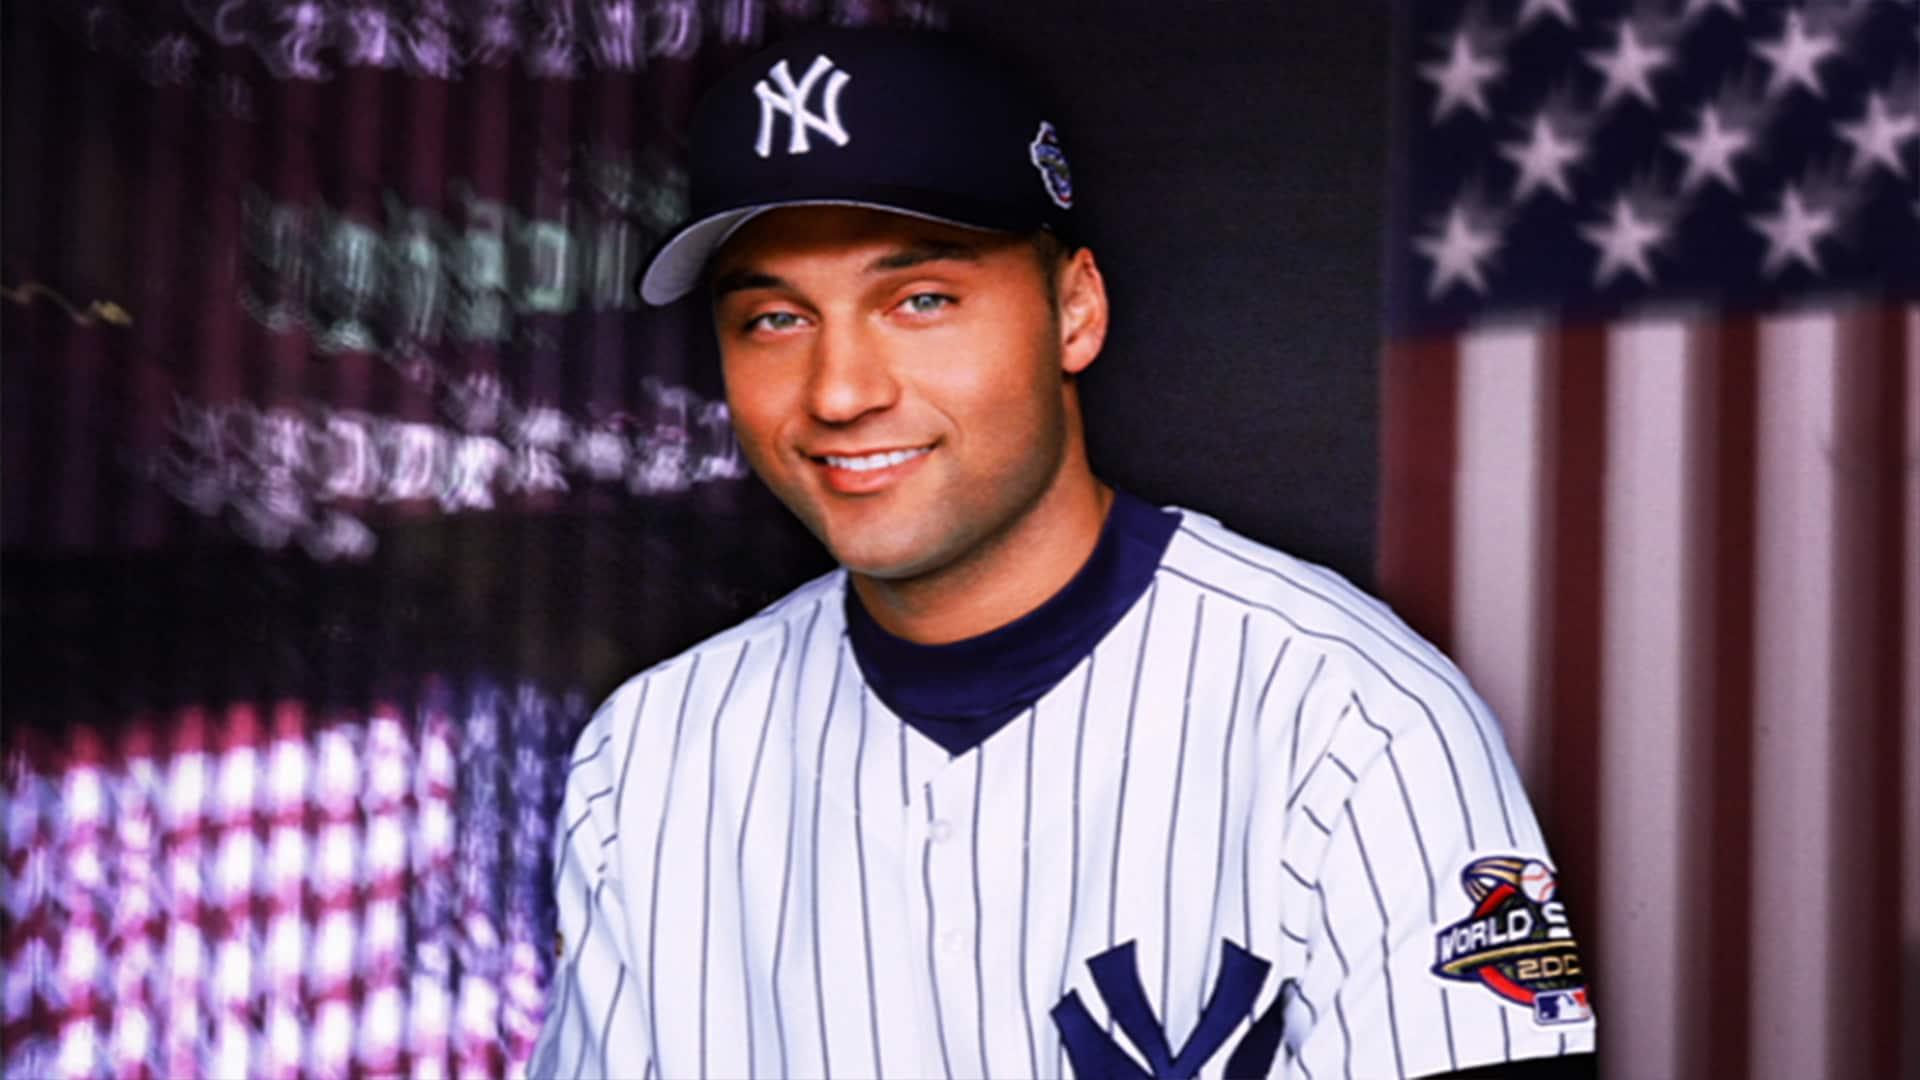 Derek Jeter: December 1, 2001